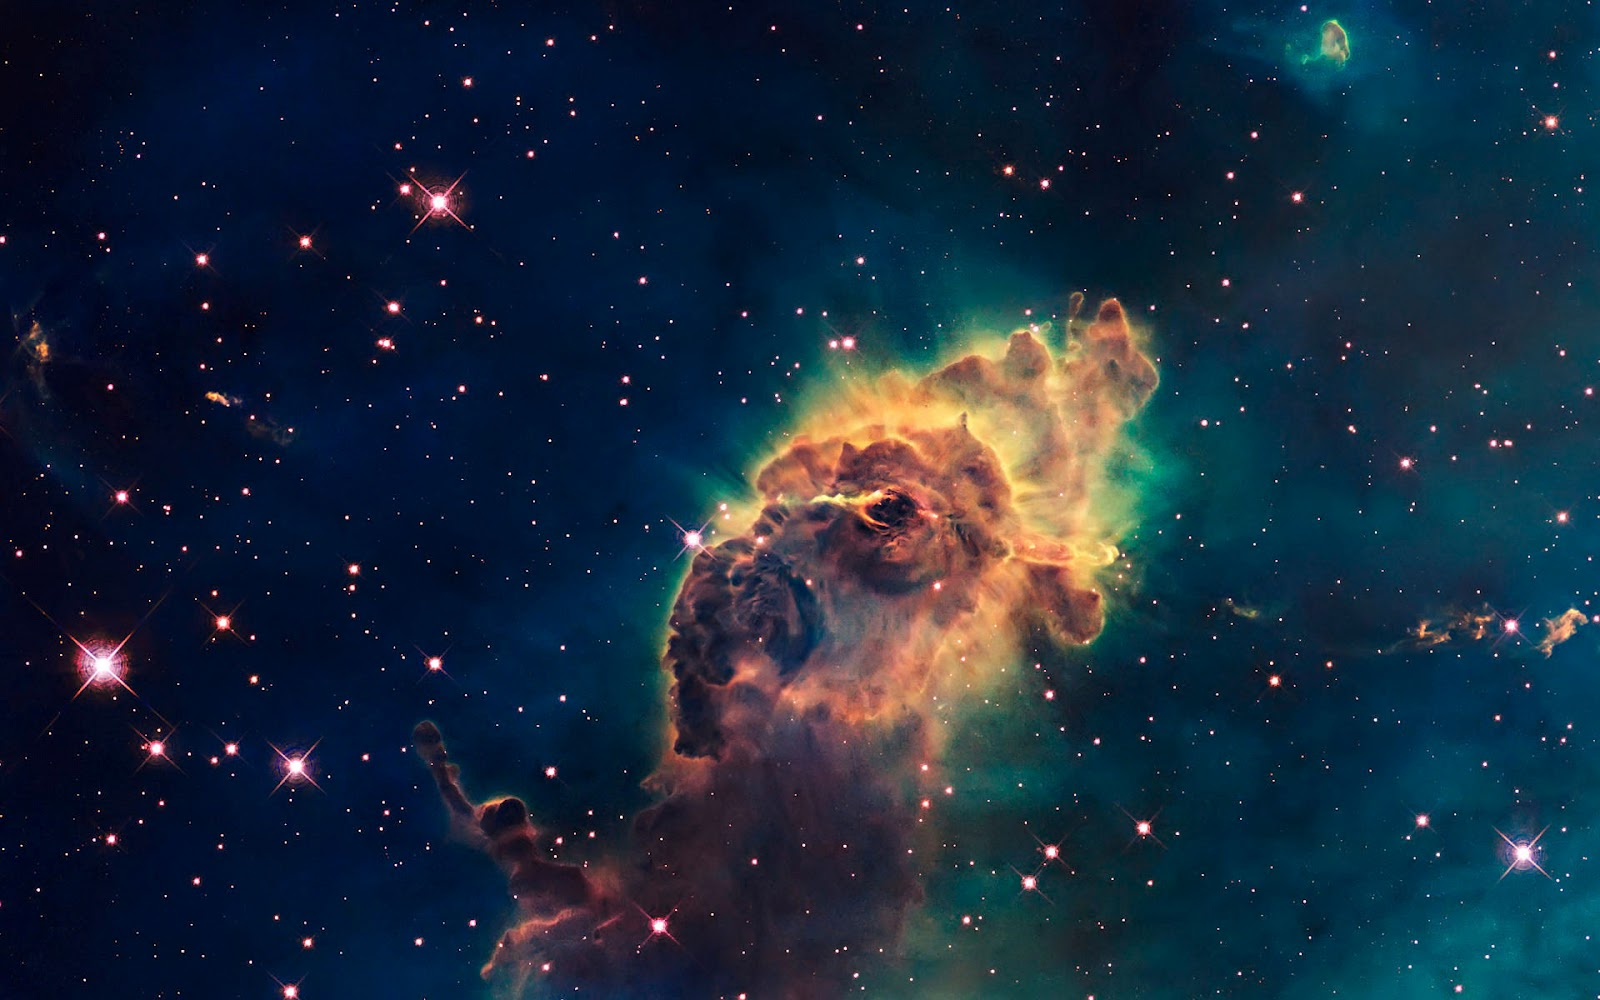 galaxy wallpaper hd 8182 8514 hd wallpapers